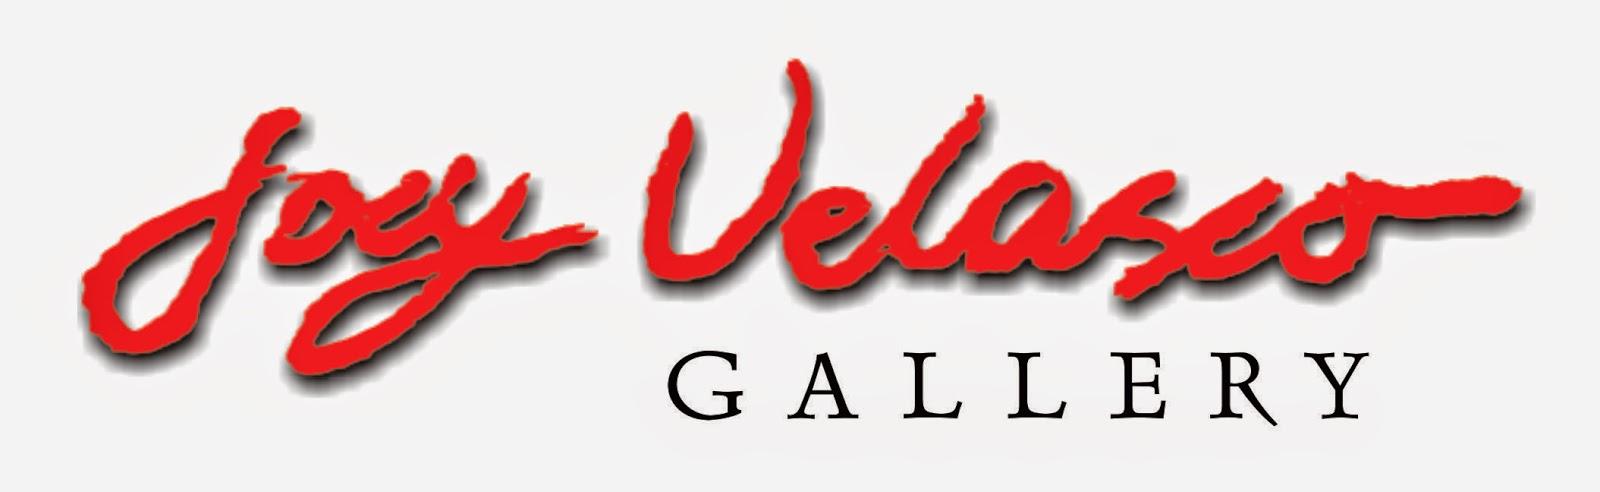 Joey Velasco Gallery logo